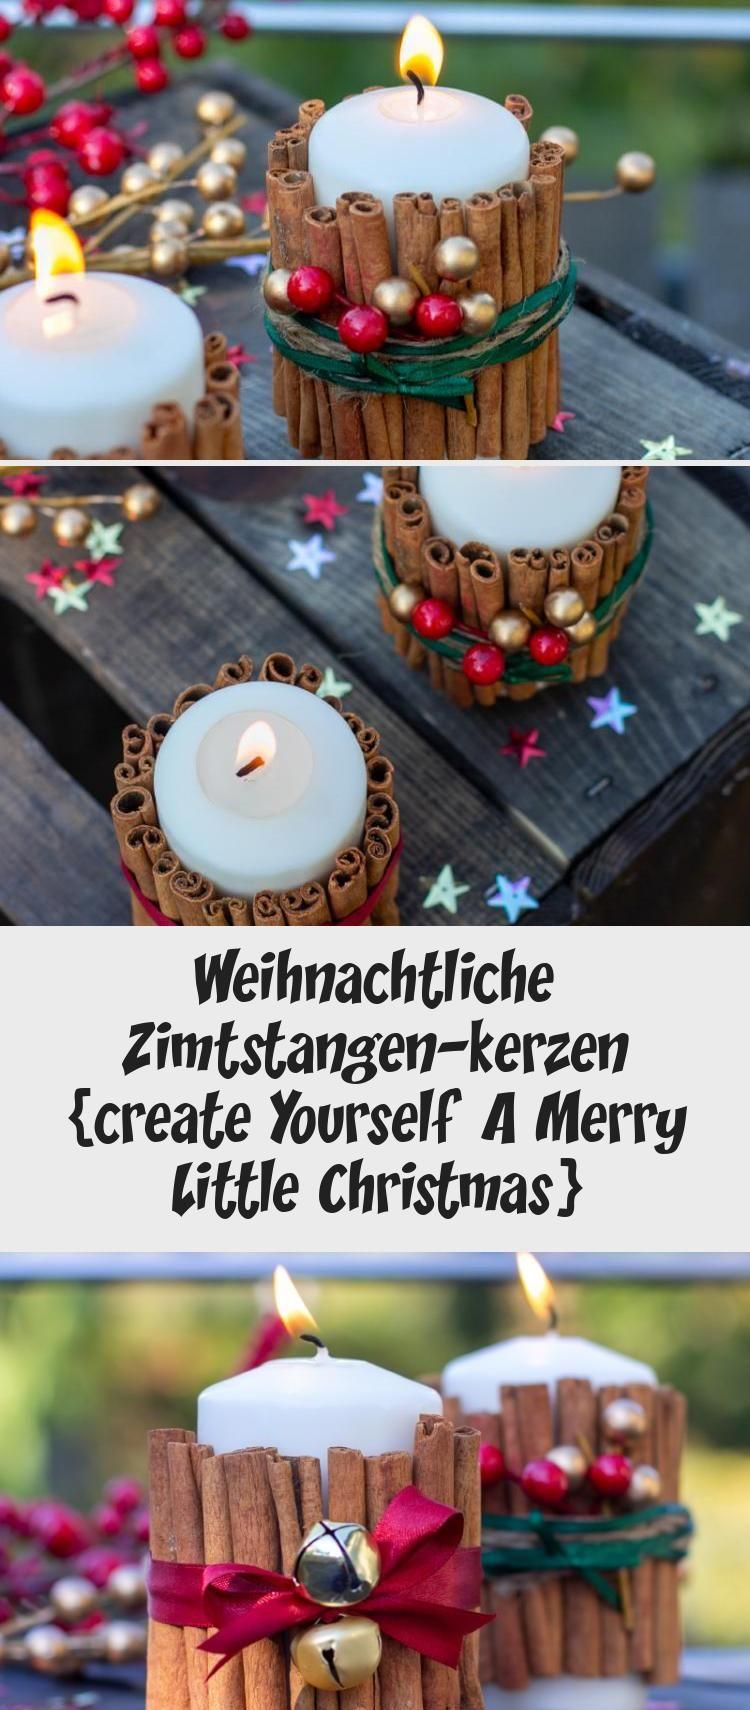 Weihnachtliche Zimtstangen Kerzen Create Yourself A Merry Little Christmas Dekoration In 2020 Love Decorations Merry Little Christmas Christmas